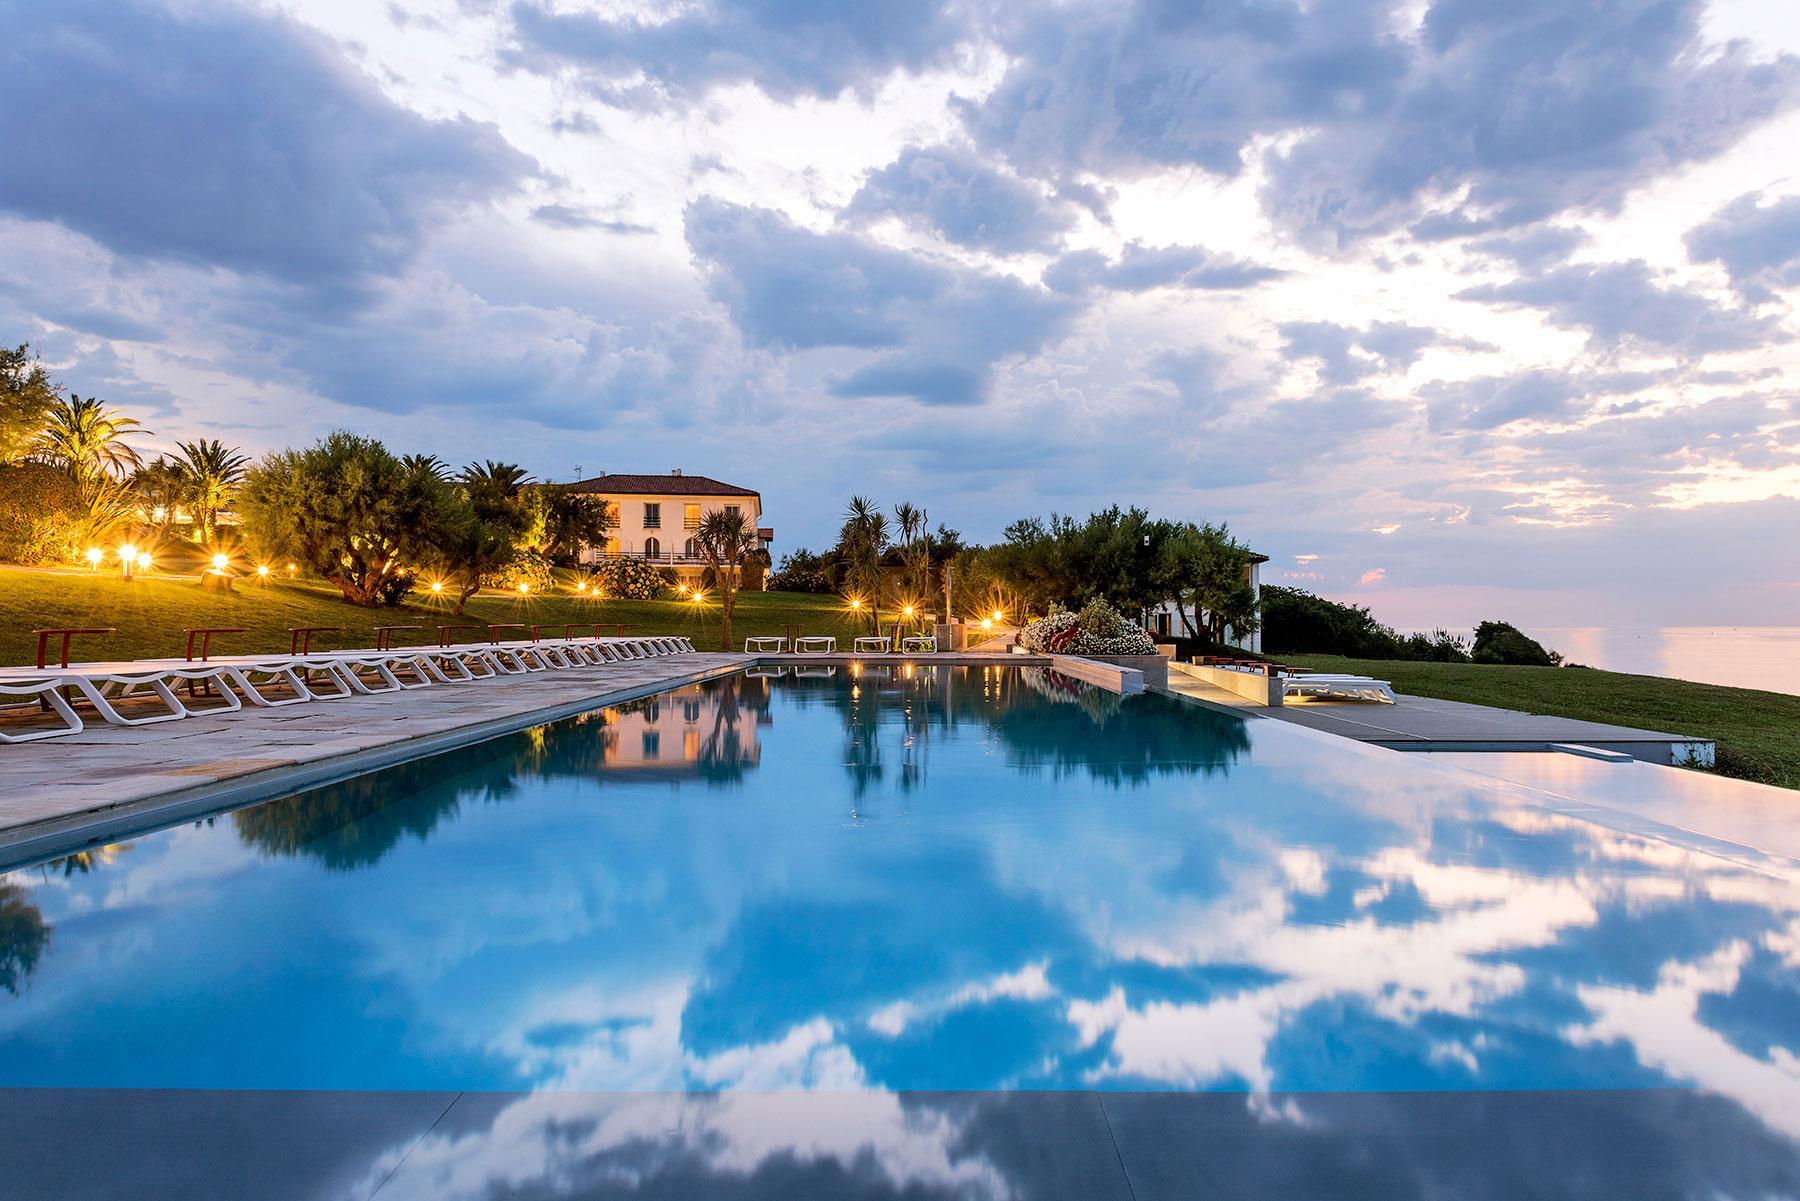 Hotel-La-Reserve-Saint-Jean-de-Luz_Piscine_SwimmingPooljpg